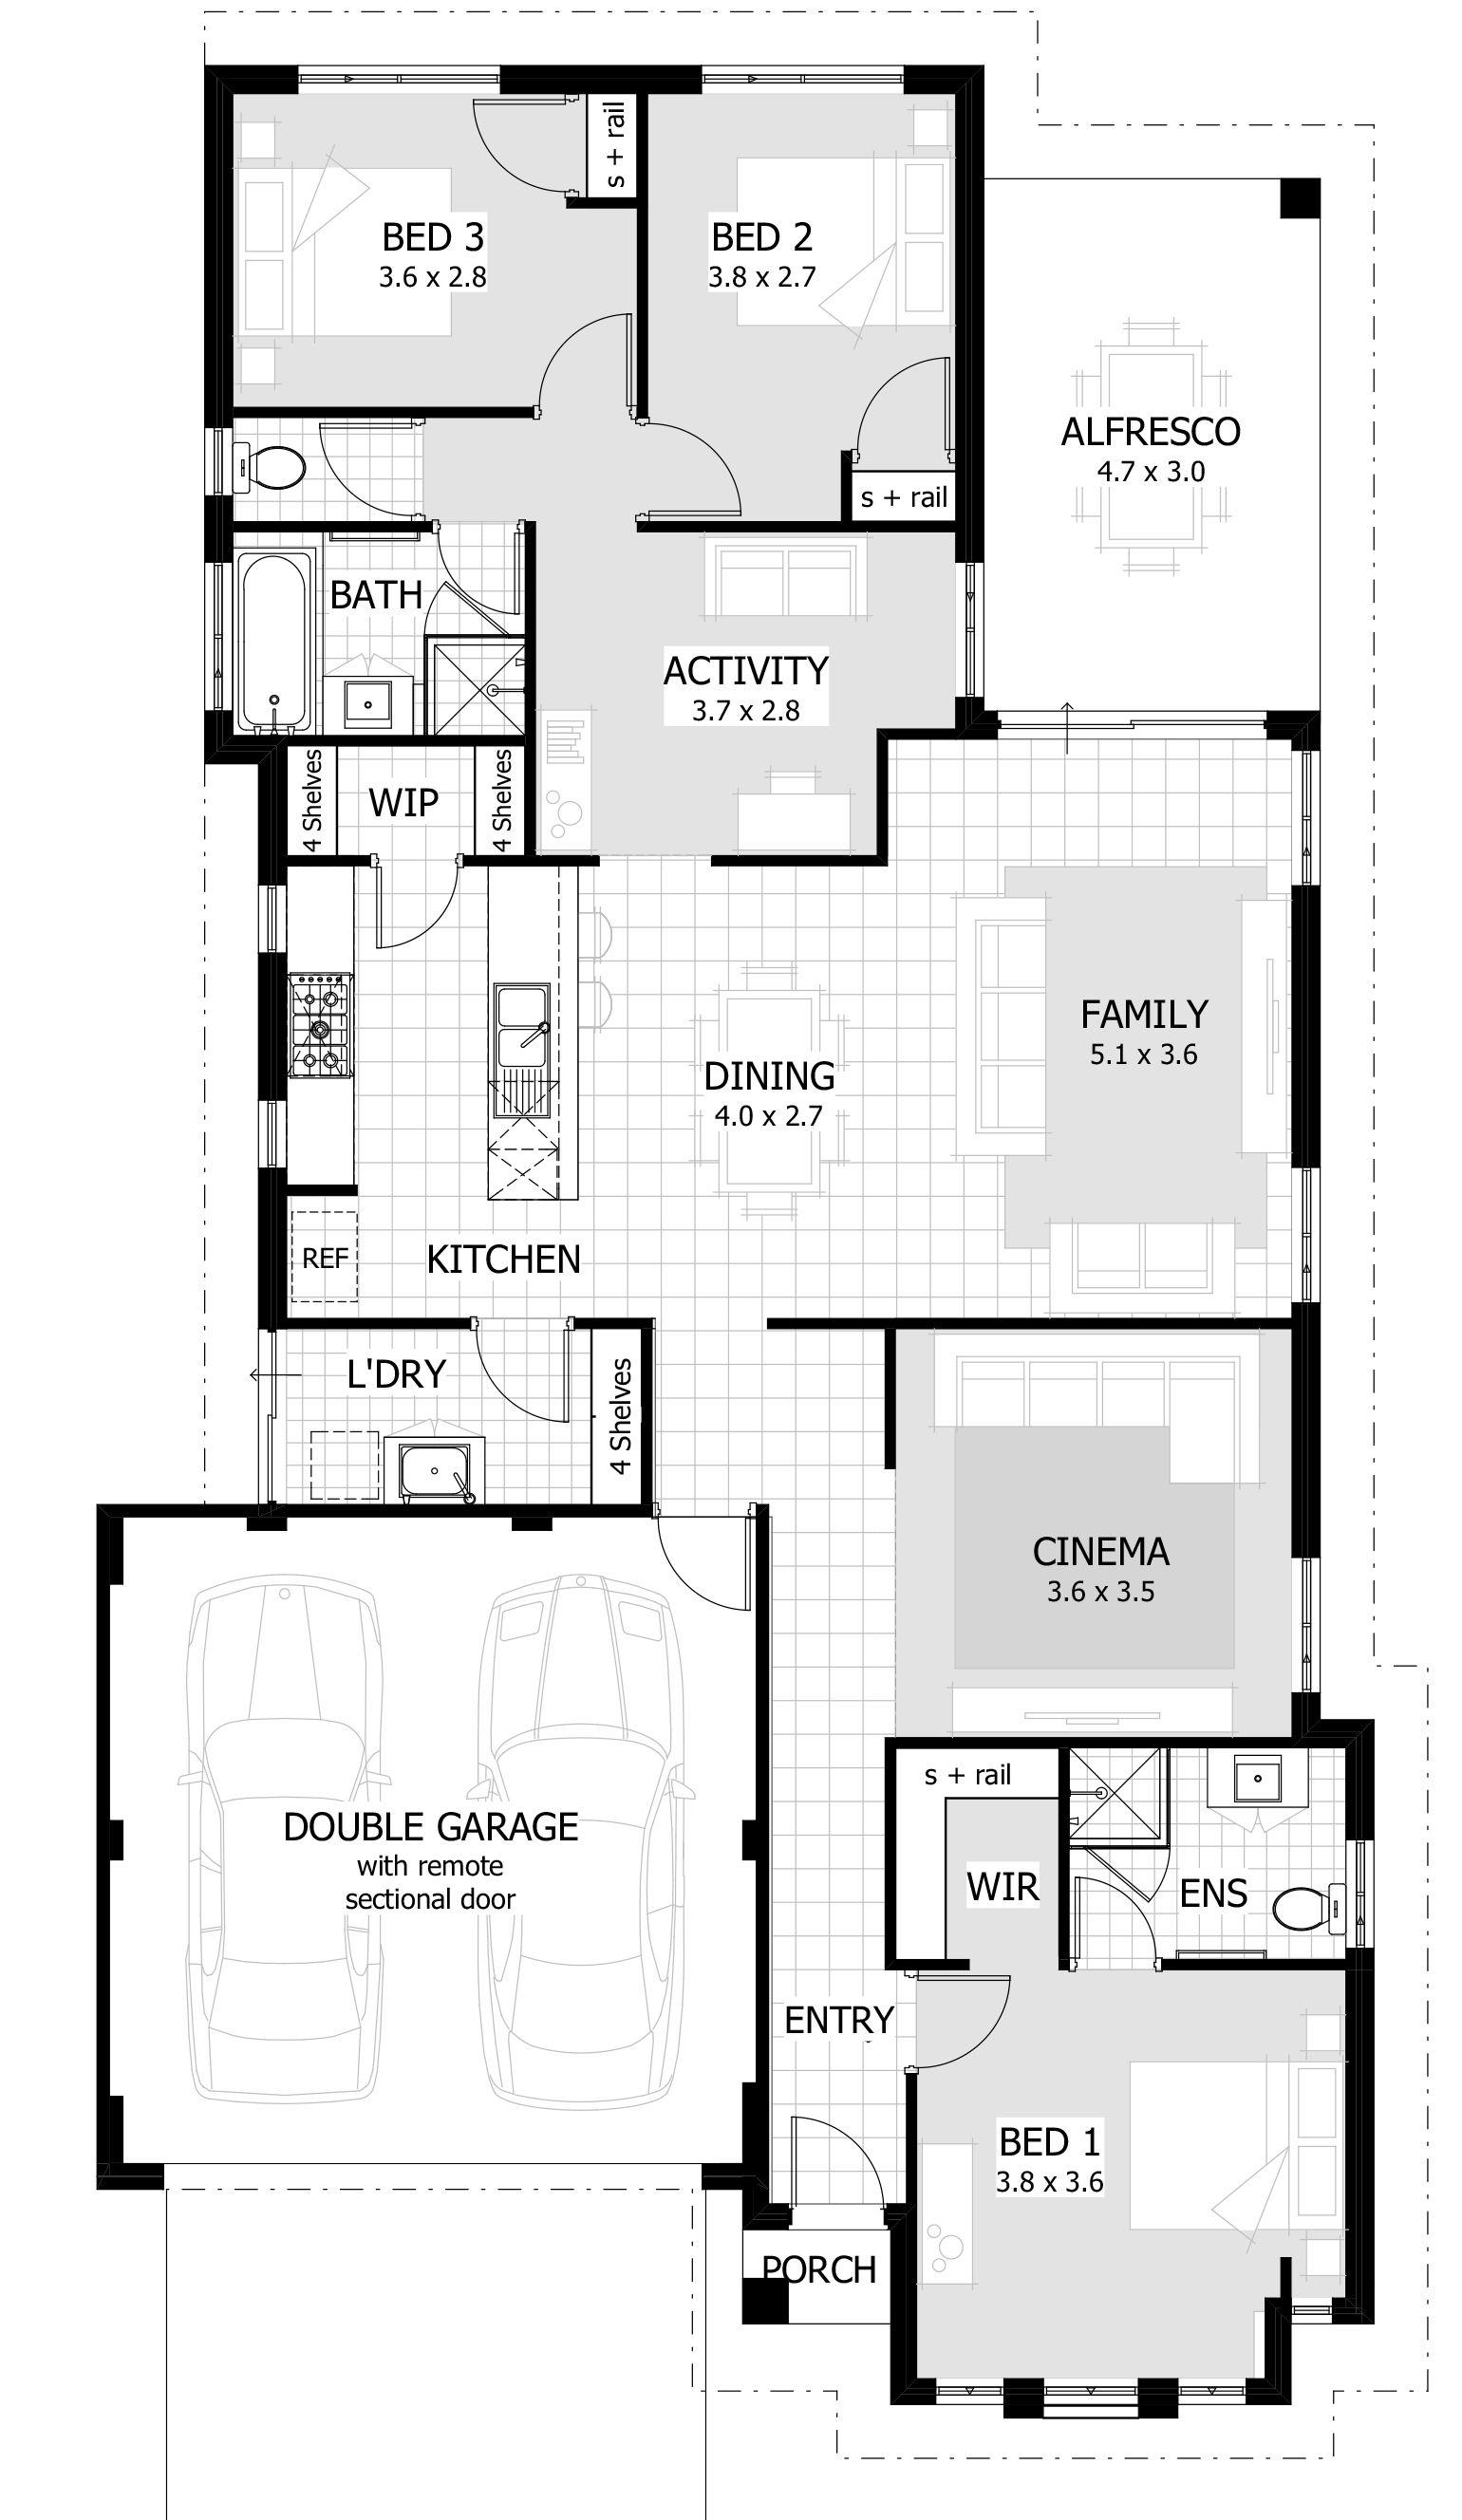 House designs perth new single storey home also floor plans rh pinterest